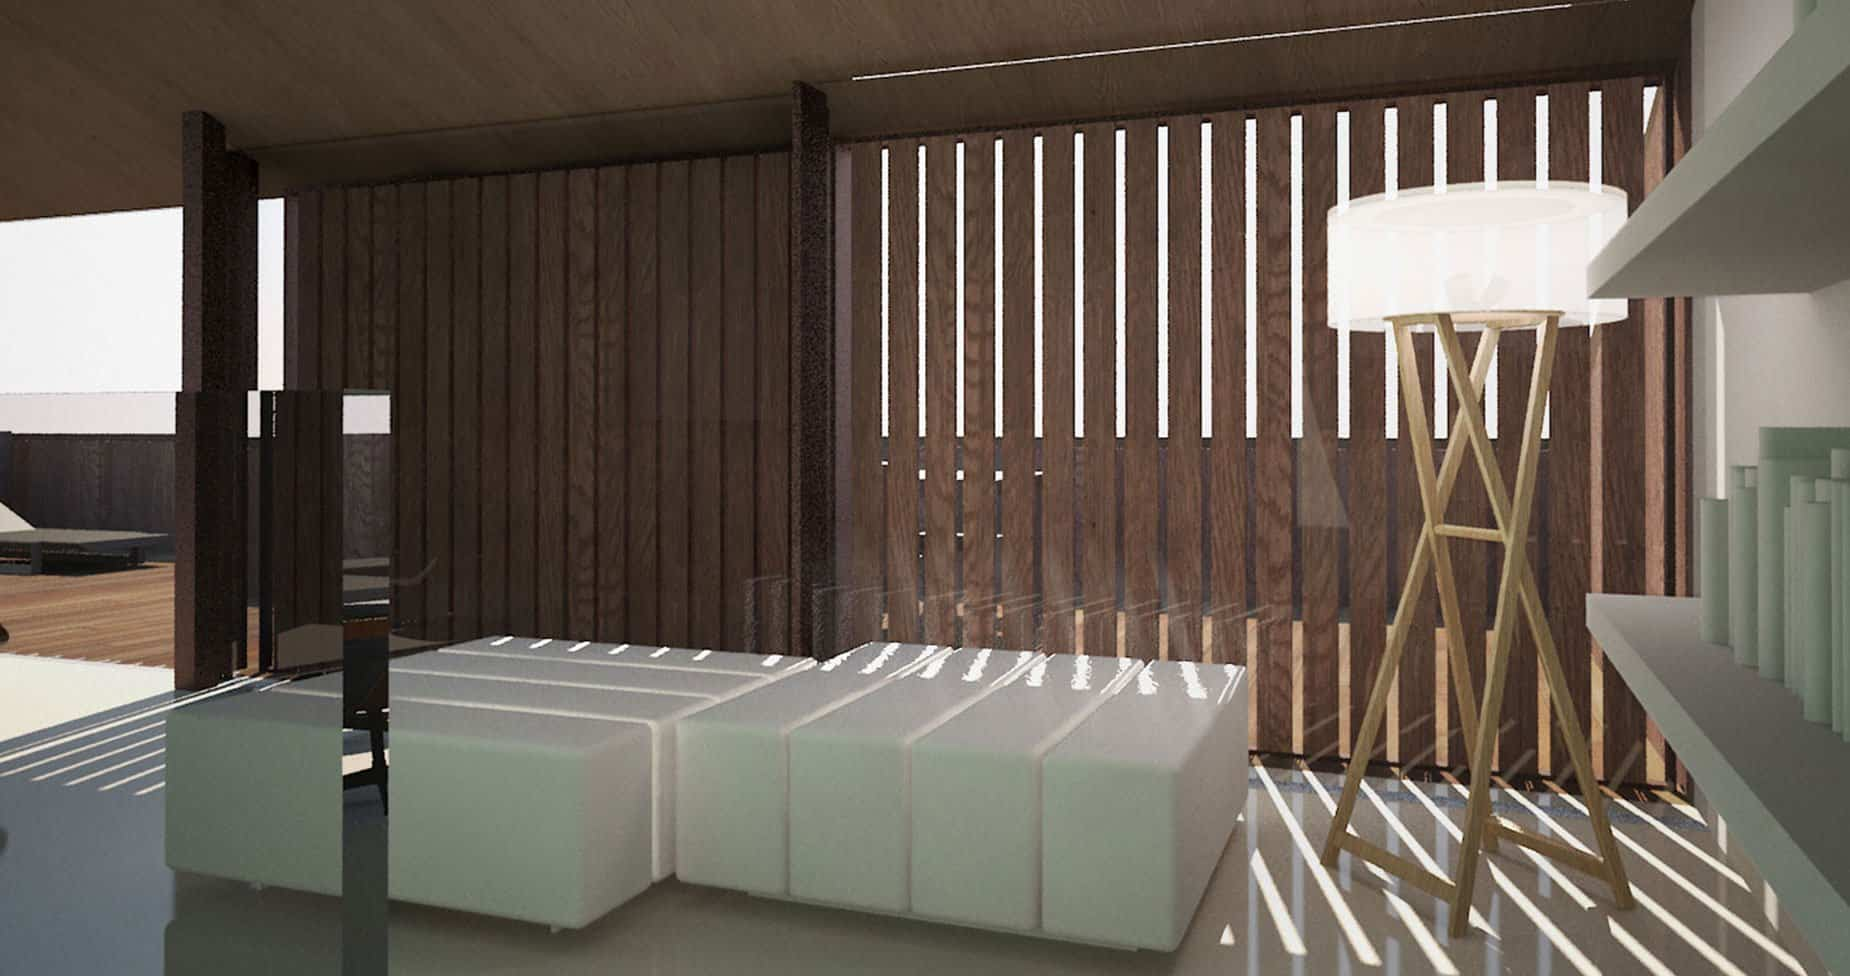 Casa en la huerta arquitectura cultivada arquitectura ideal for Casa interior